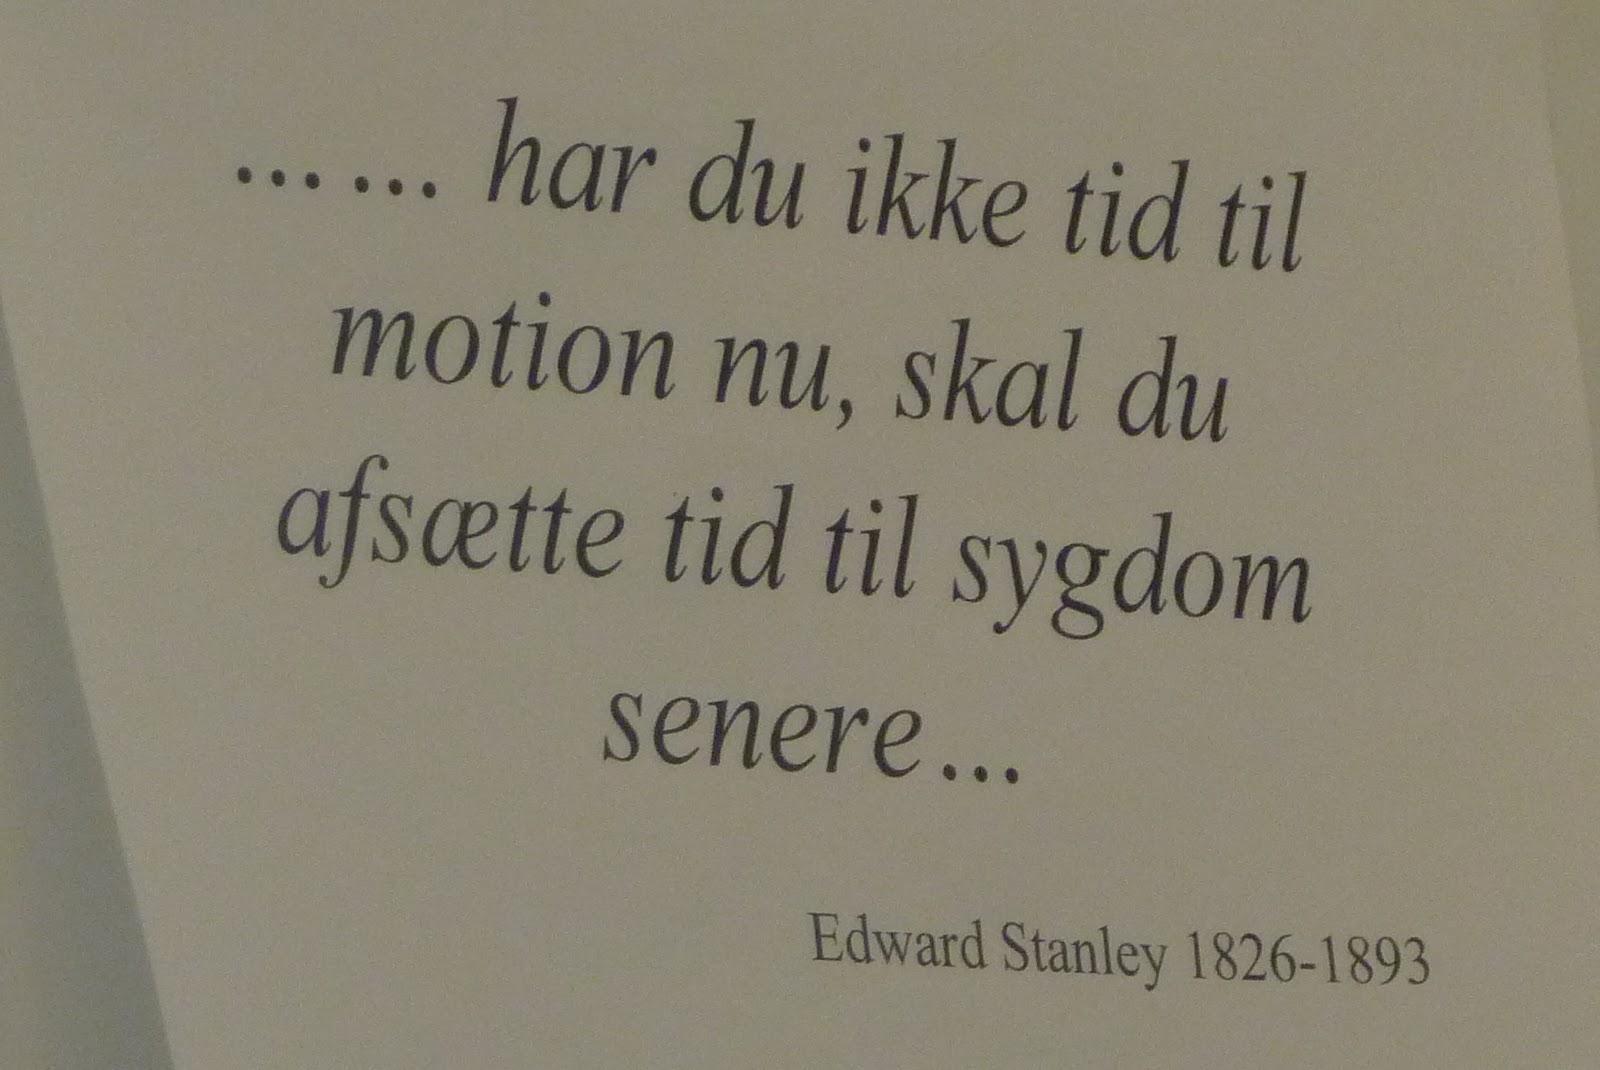 bordel Istedgade ord w i dansk